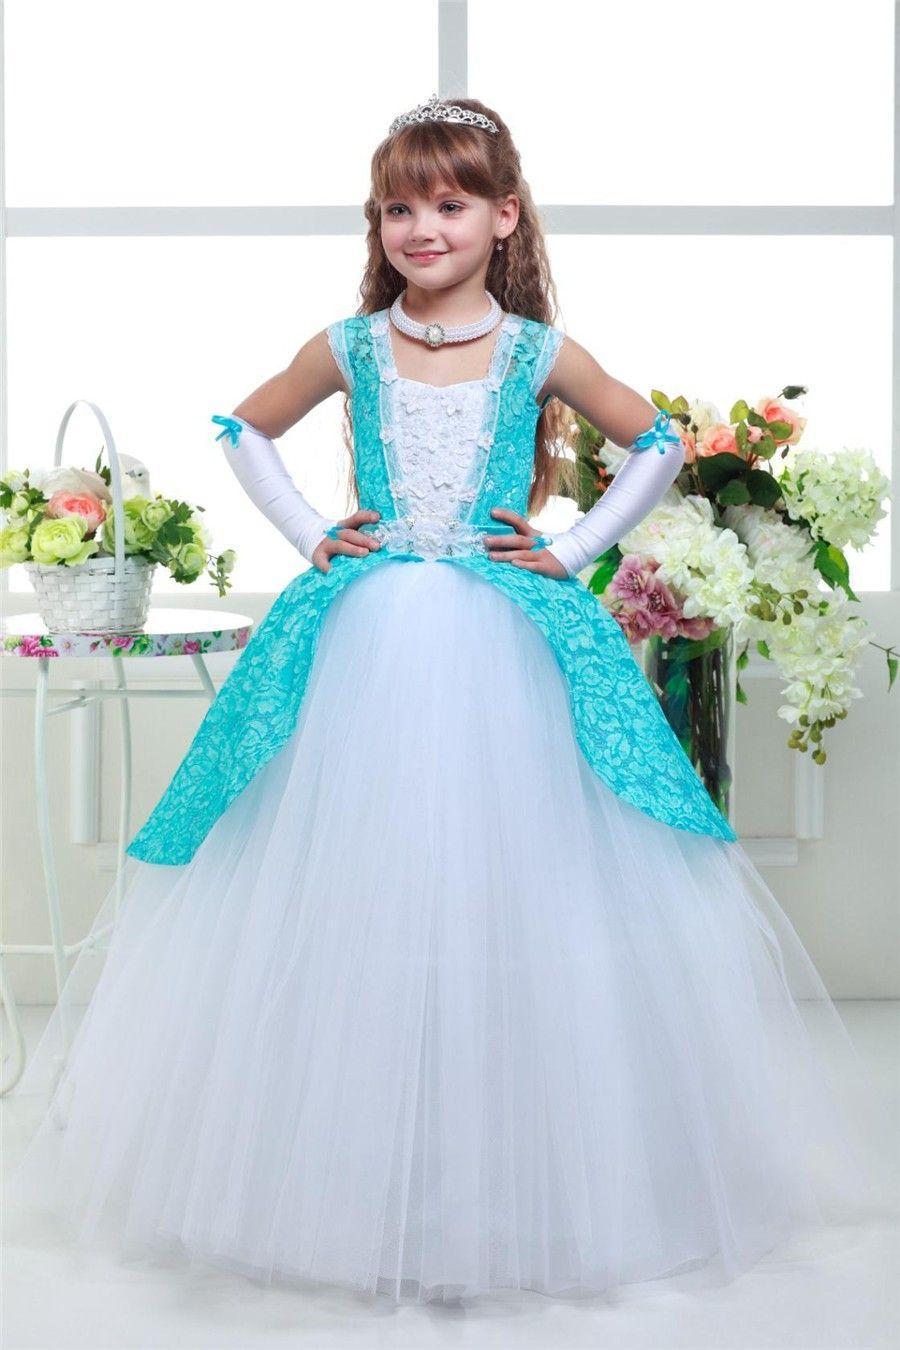 2017 Sweet and elegant Colorful Backless Sleeveless Flower Girl Halter Girls Pageant Dresses First Communion Dresses